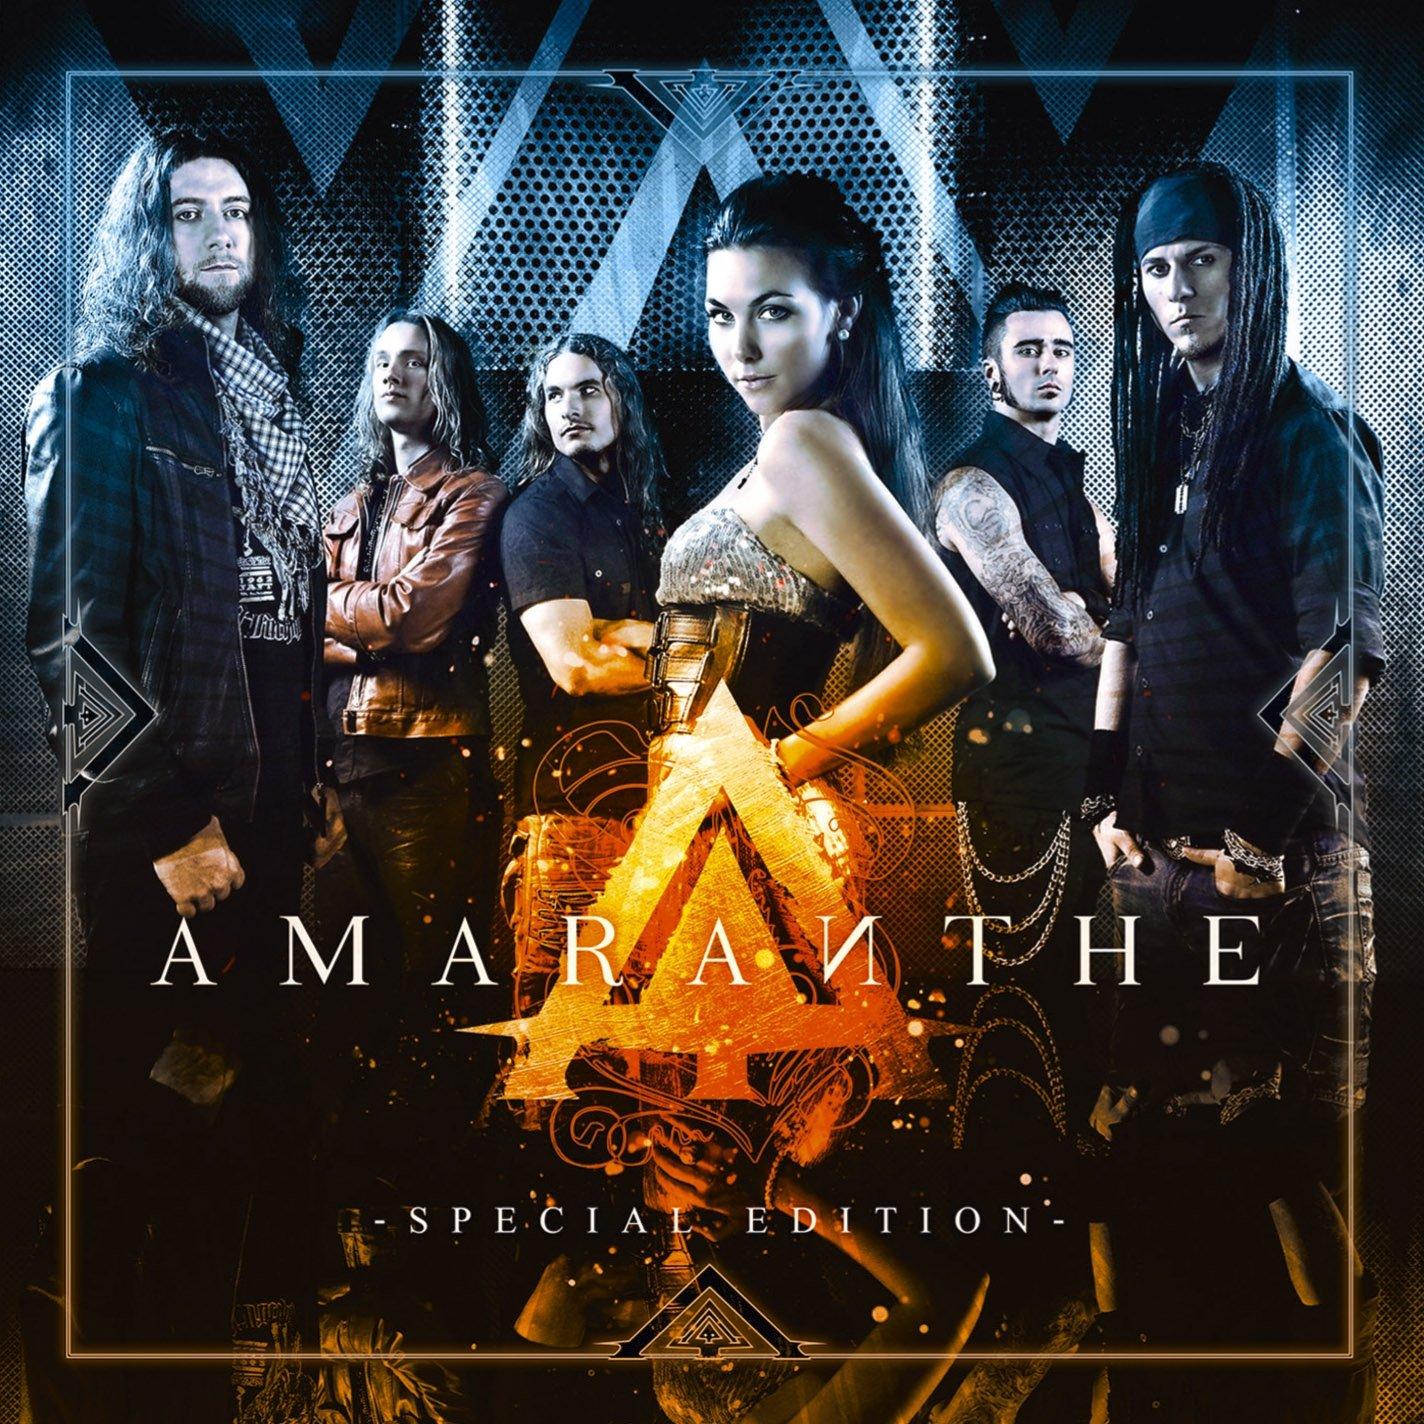 Amaranthe - Amaranthe (Special Edition)